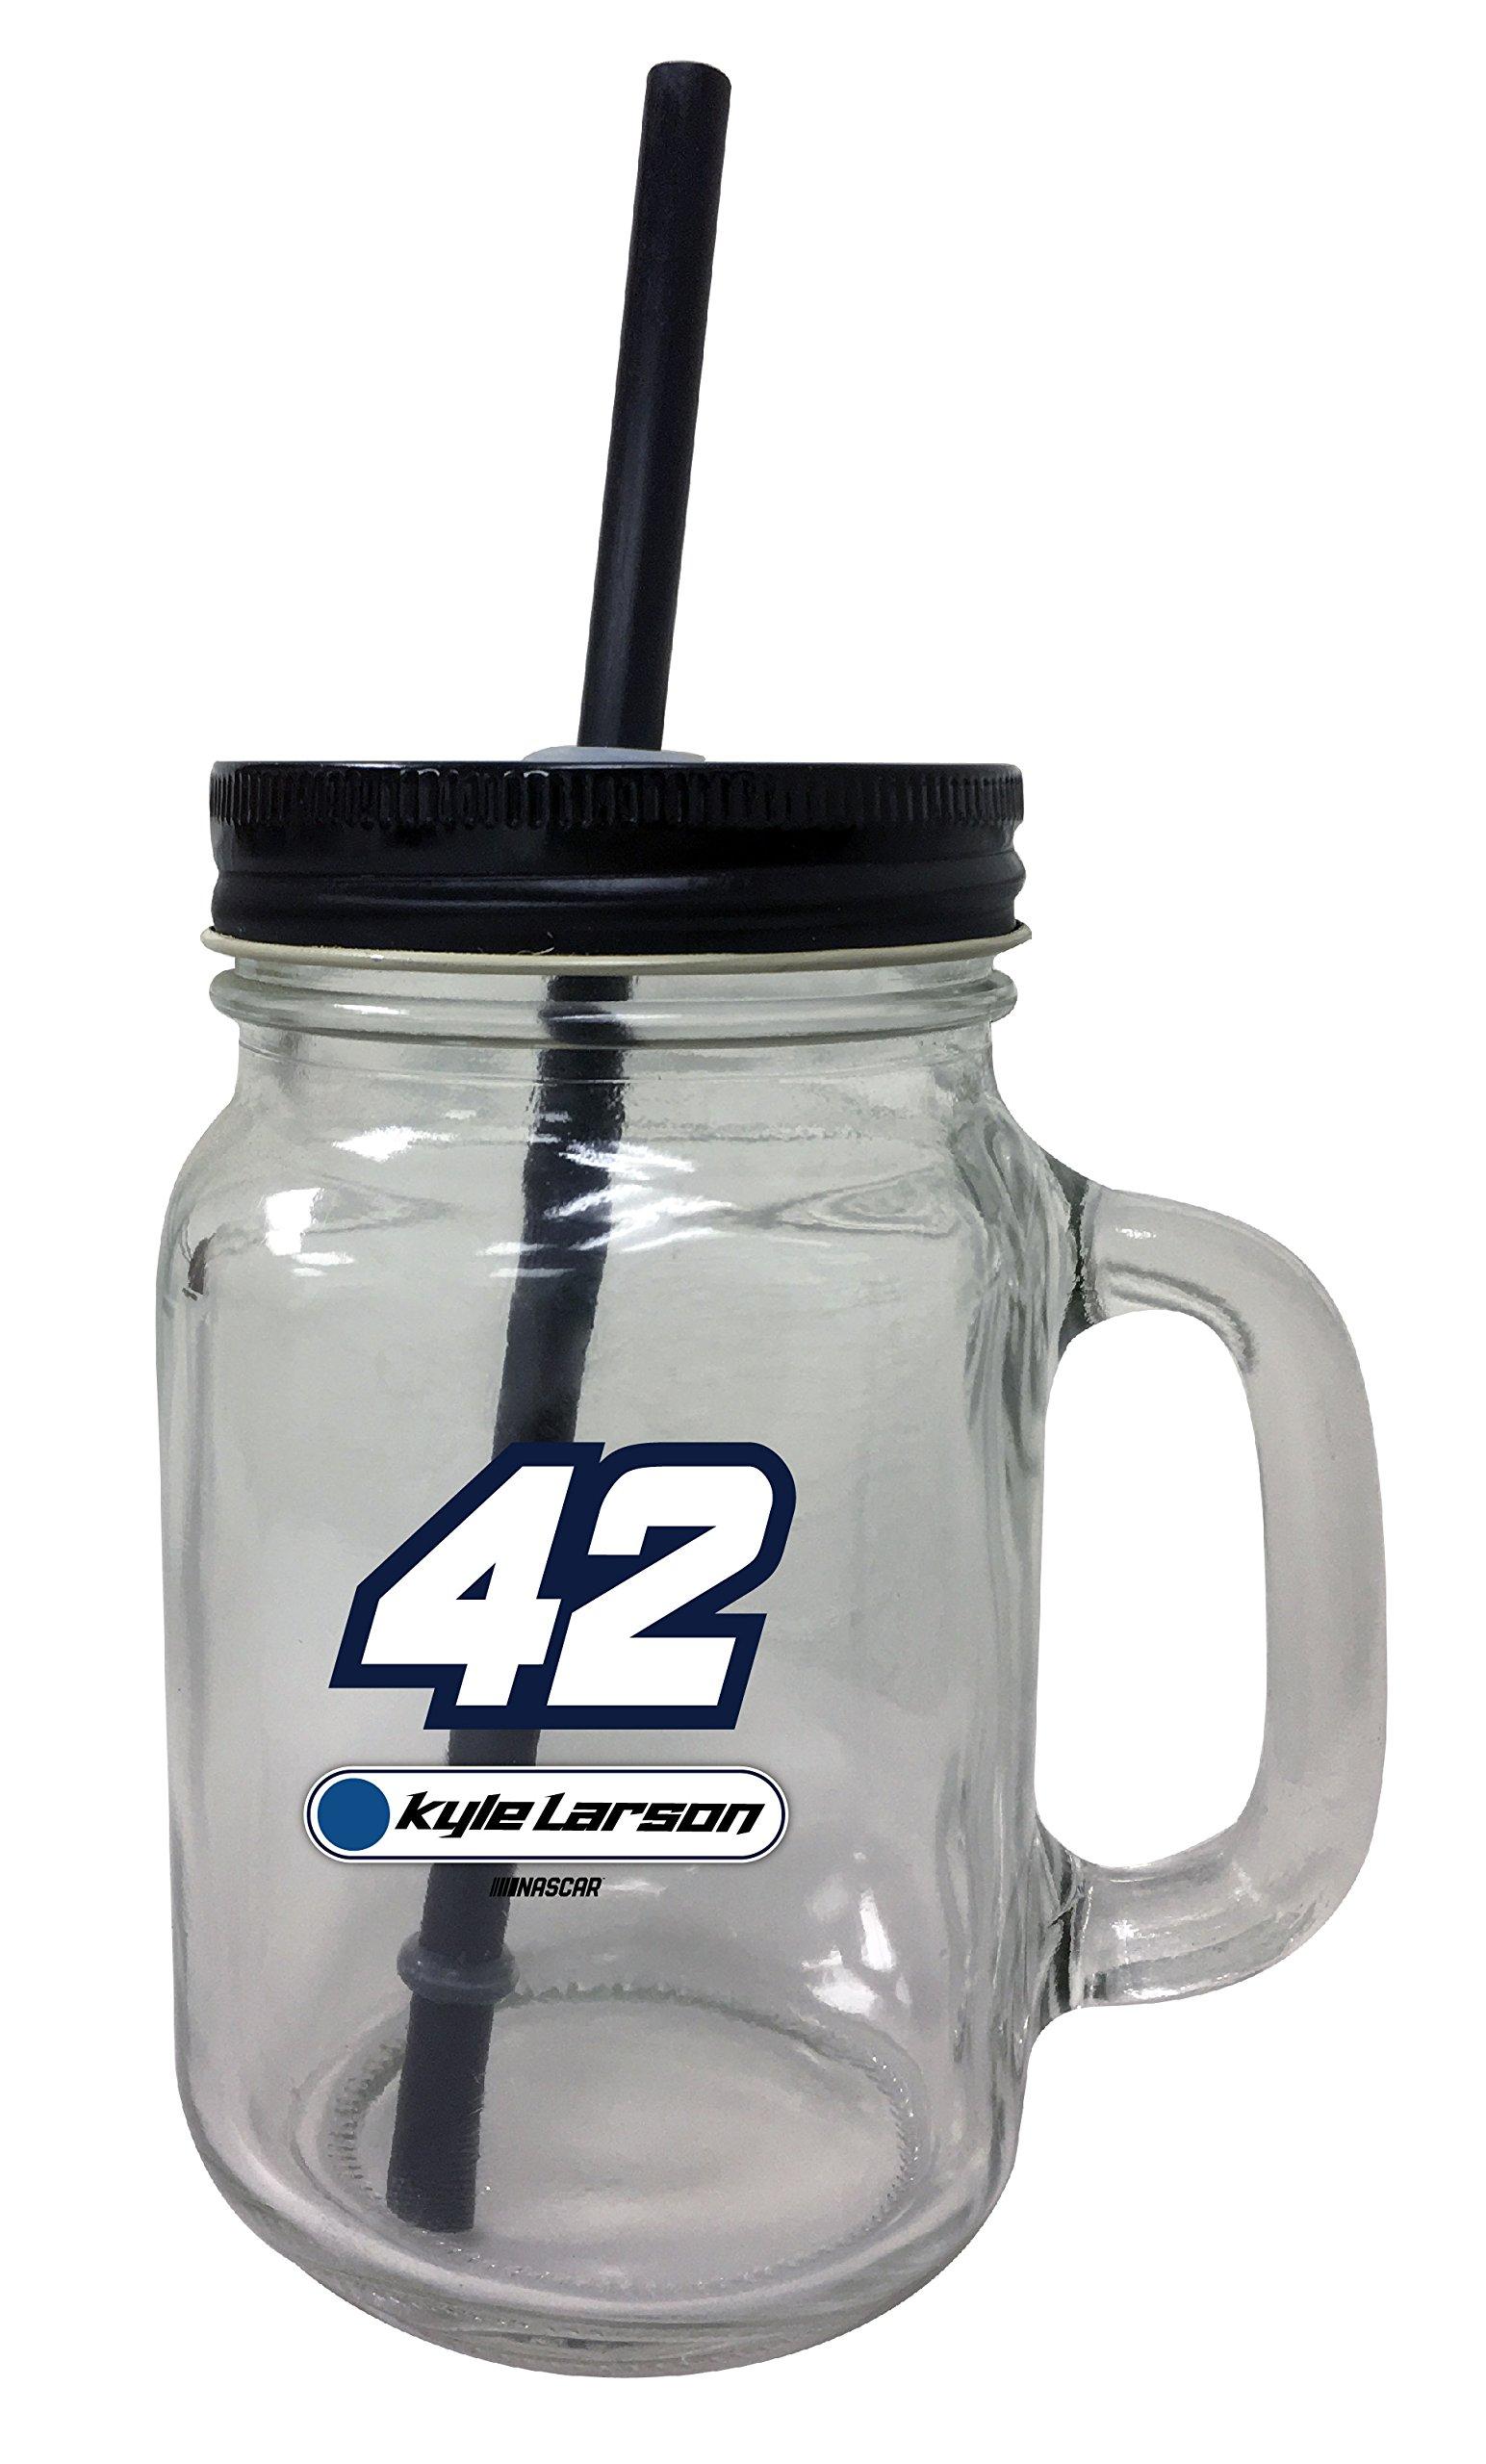 Kyle Larson #42 Mason Jar Glass Tumbler